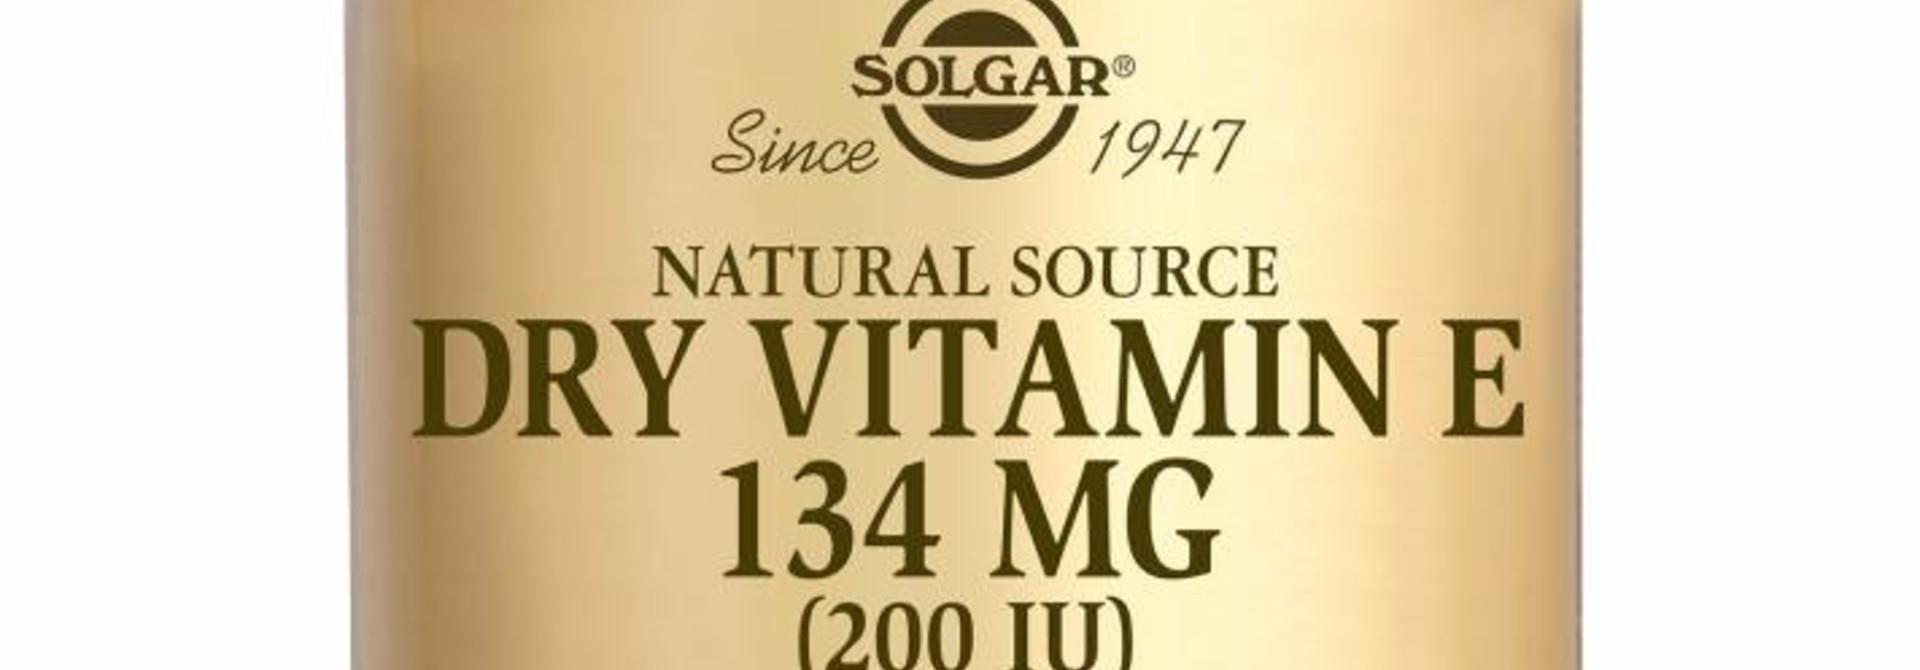 Vitamin E 134 mg/200 IU Dry 50 plantaardige capsules